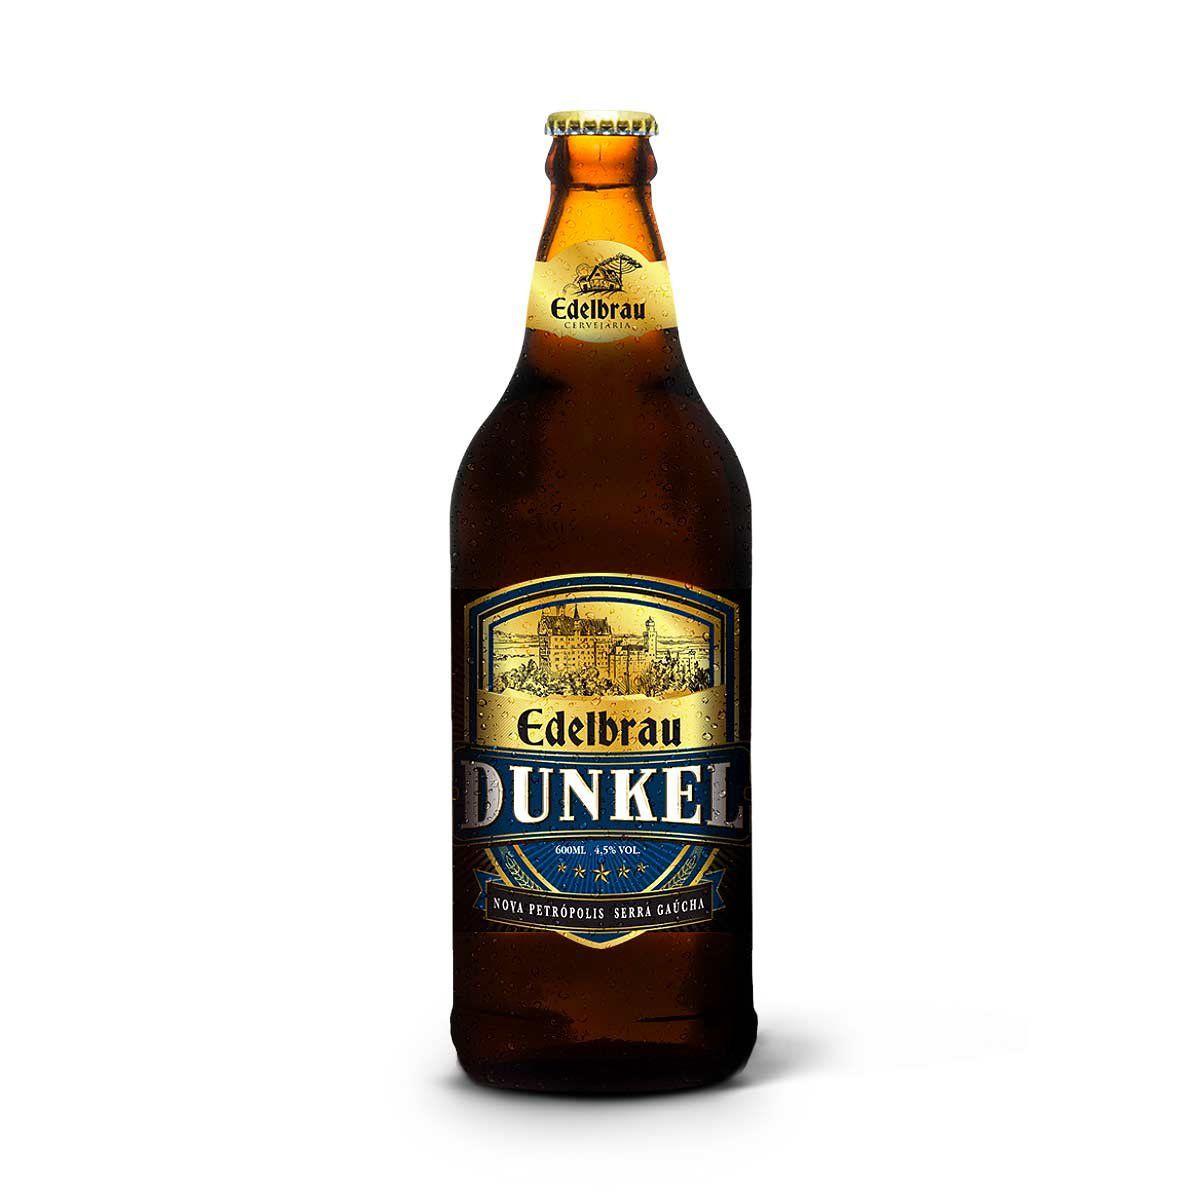 Edelbrau Dunkel 600ml